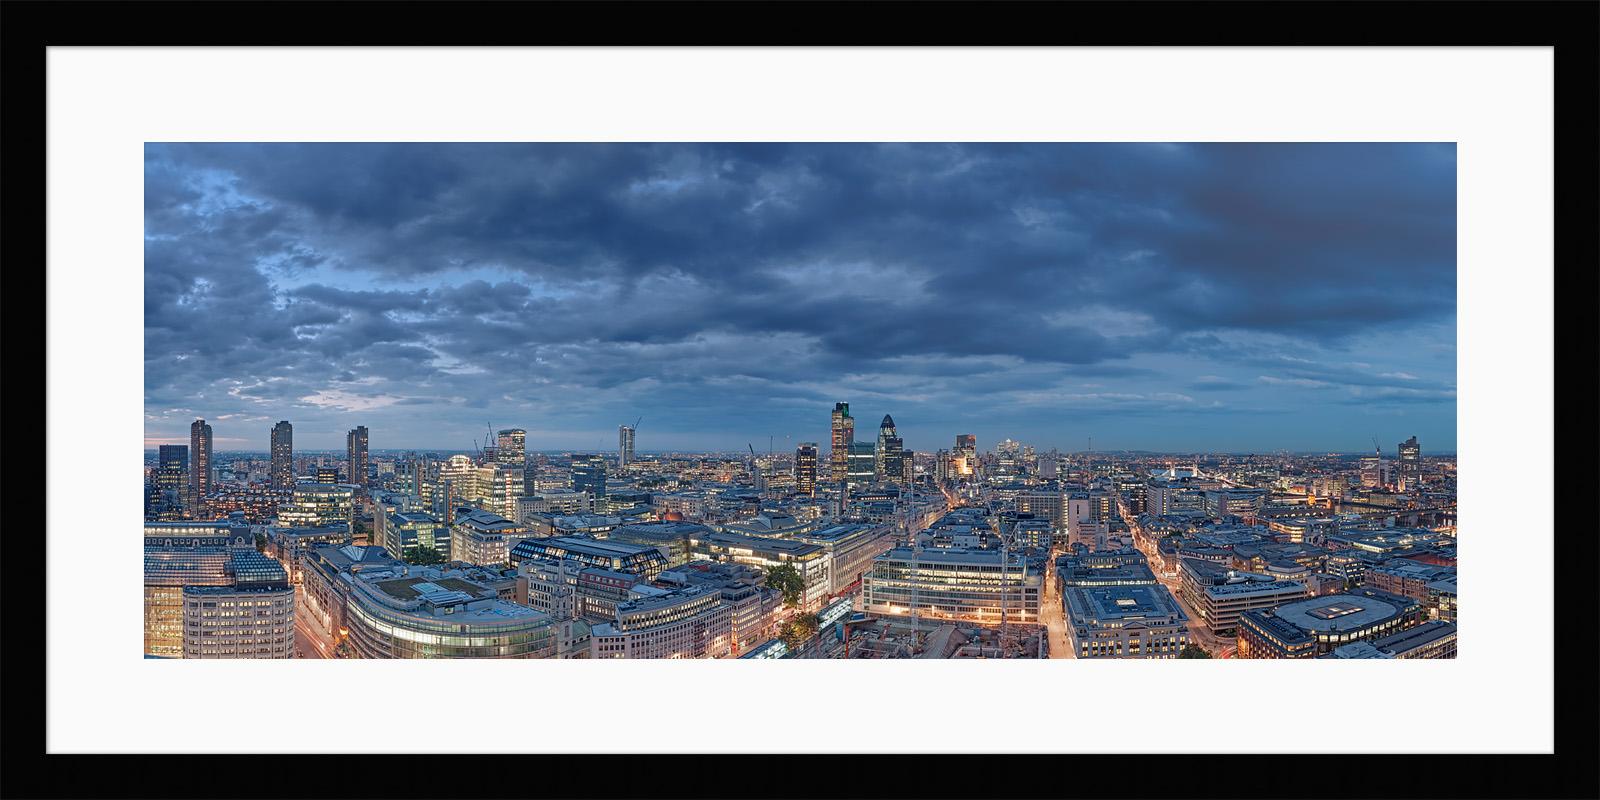 City Of London Night Falls - Framed Photo Print of London